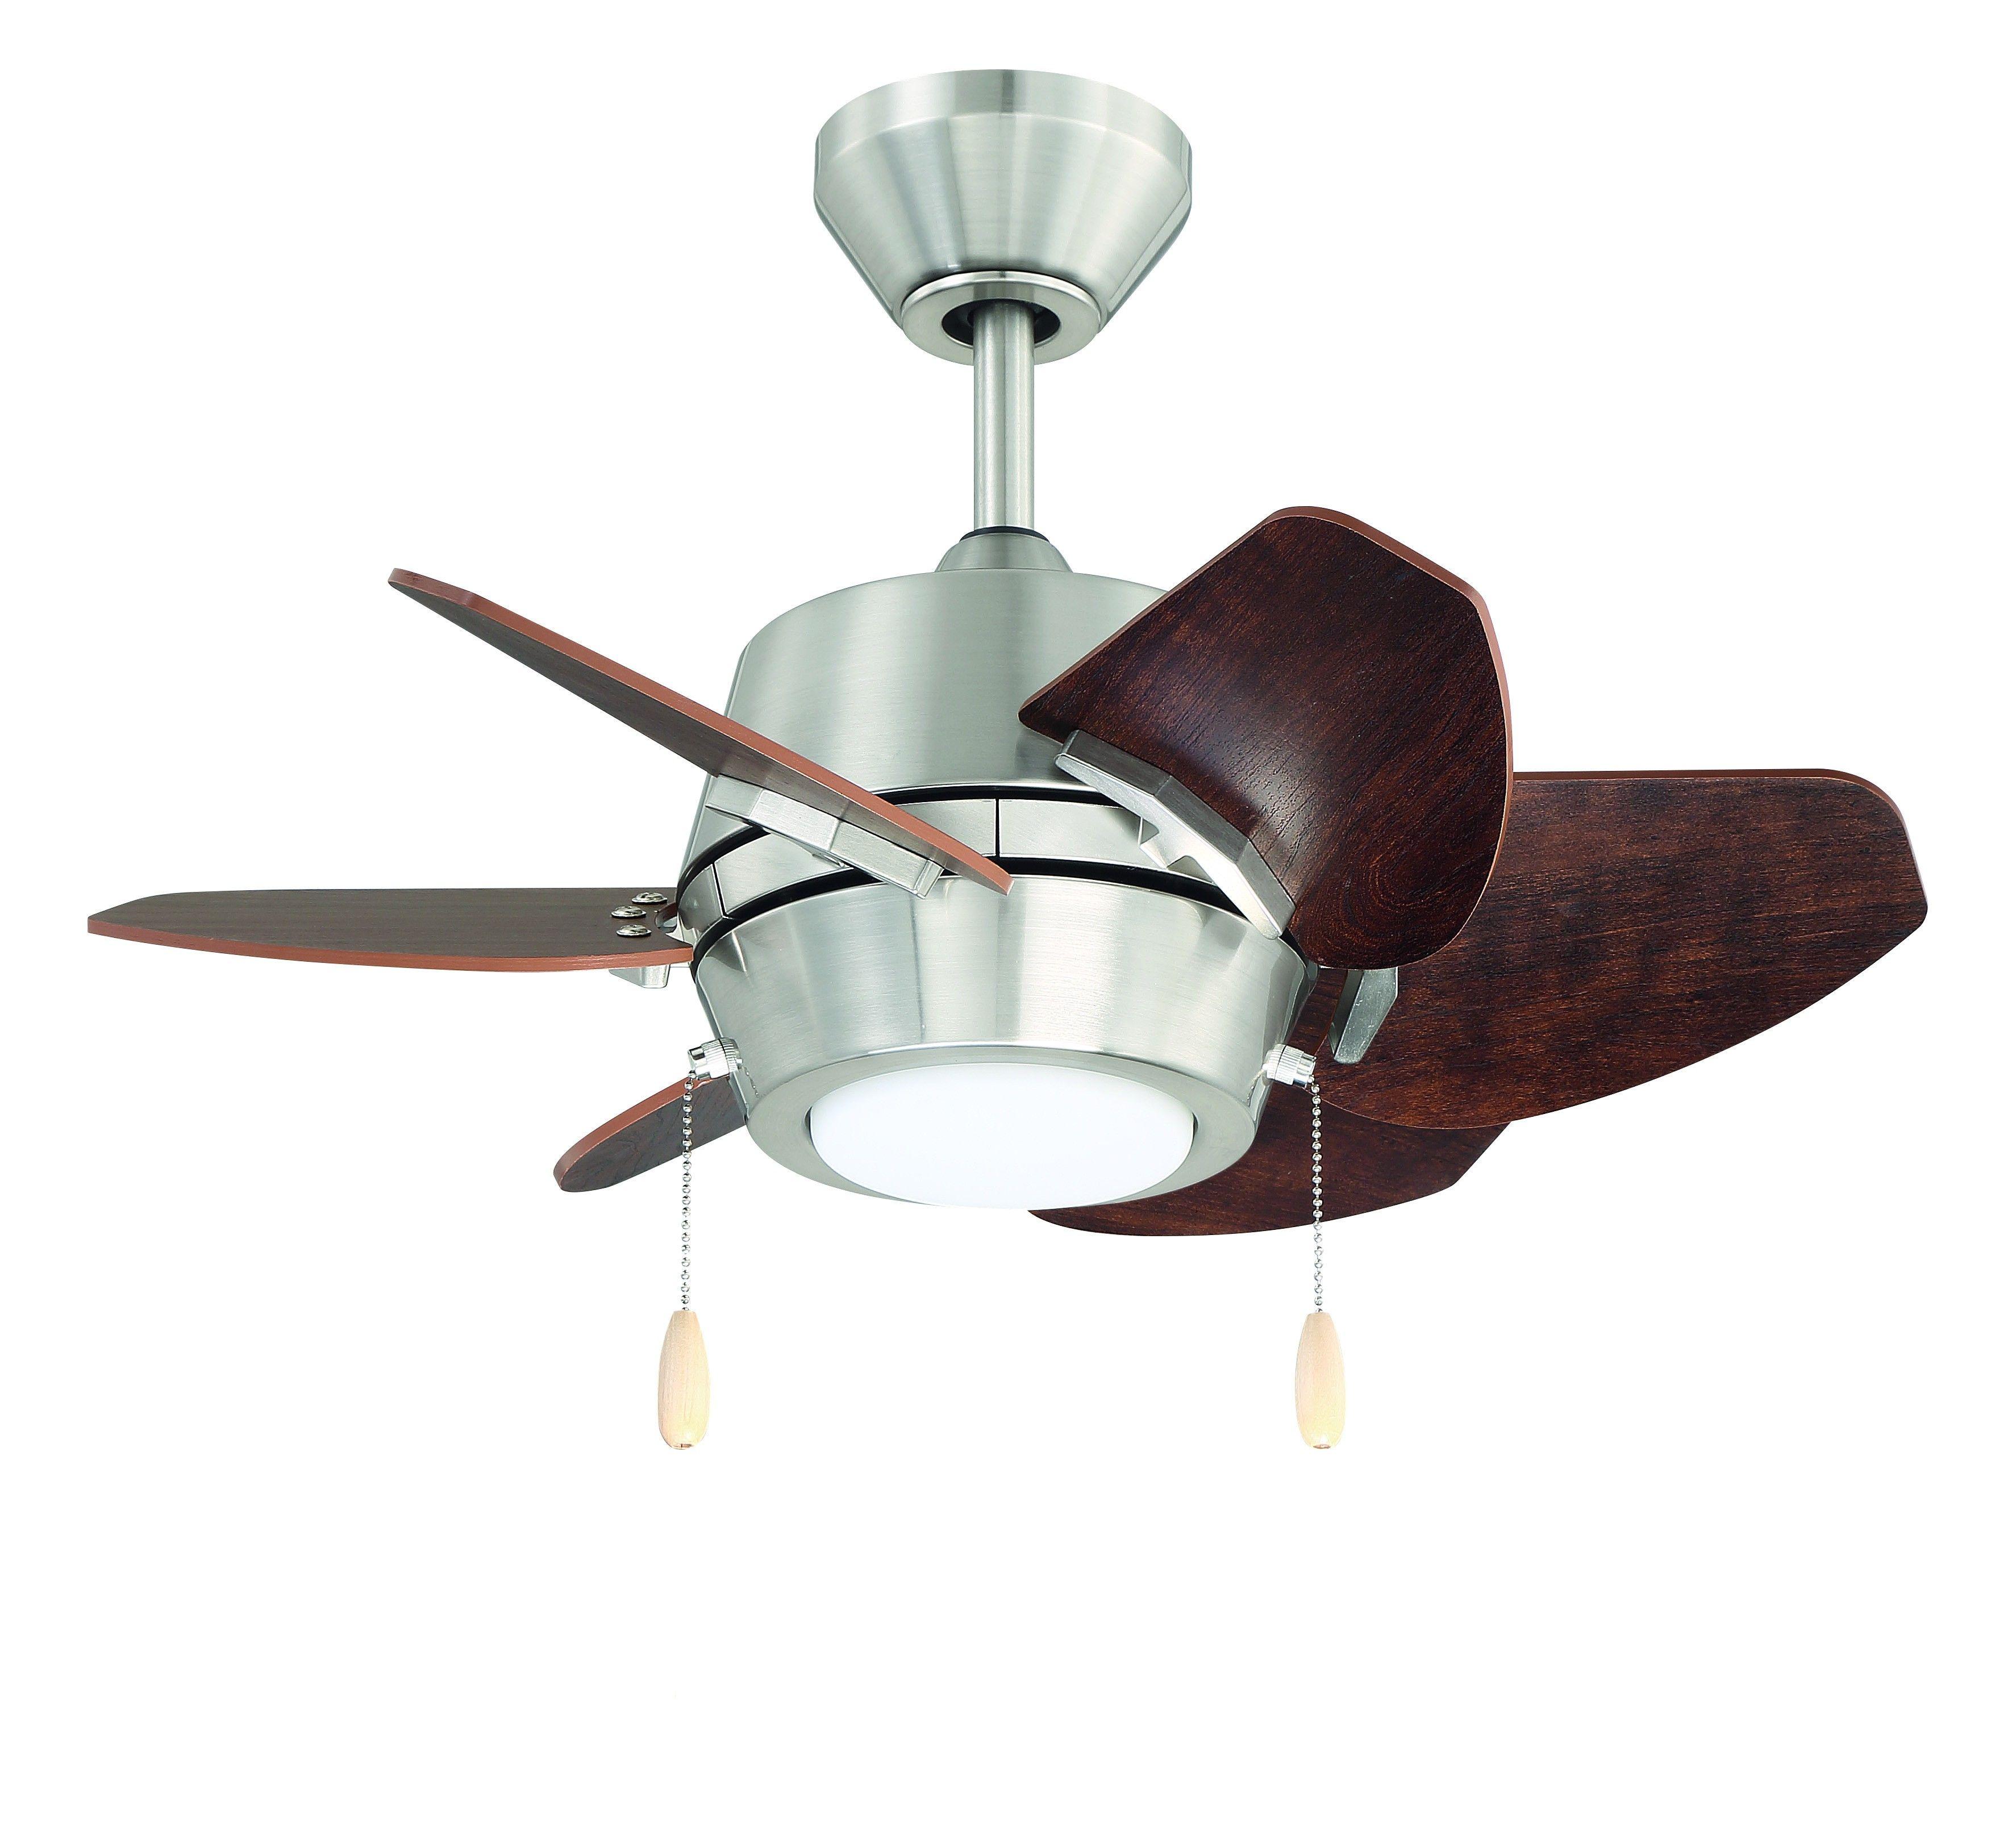 Litex Gaskin Dual Mount 6 Blade Ceiling Fan 24 In Led Light Kit In Brushed Nickel With Glazed Cherry Or Driftwood Blades In 2020 Ceiling Fans Without Lights Ceiling Fan Switch Ceiling Fan Parts